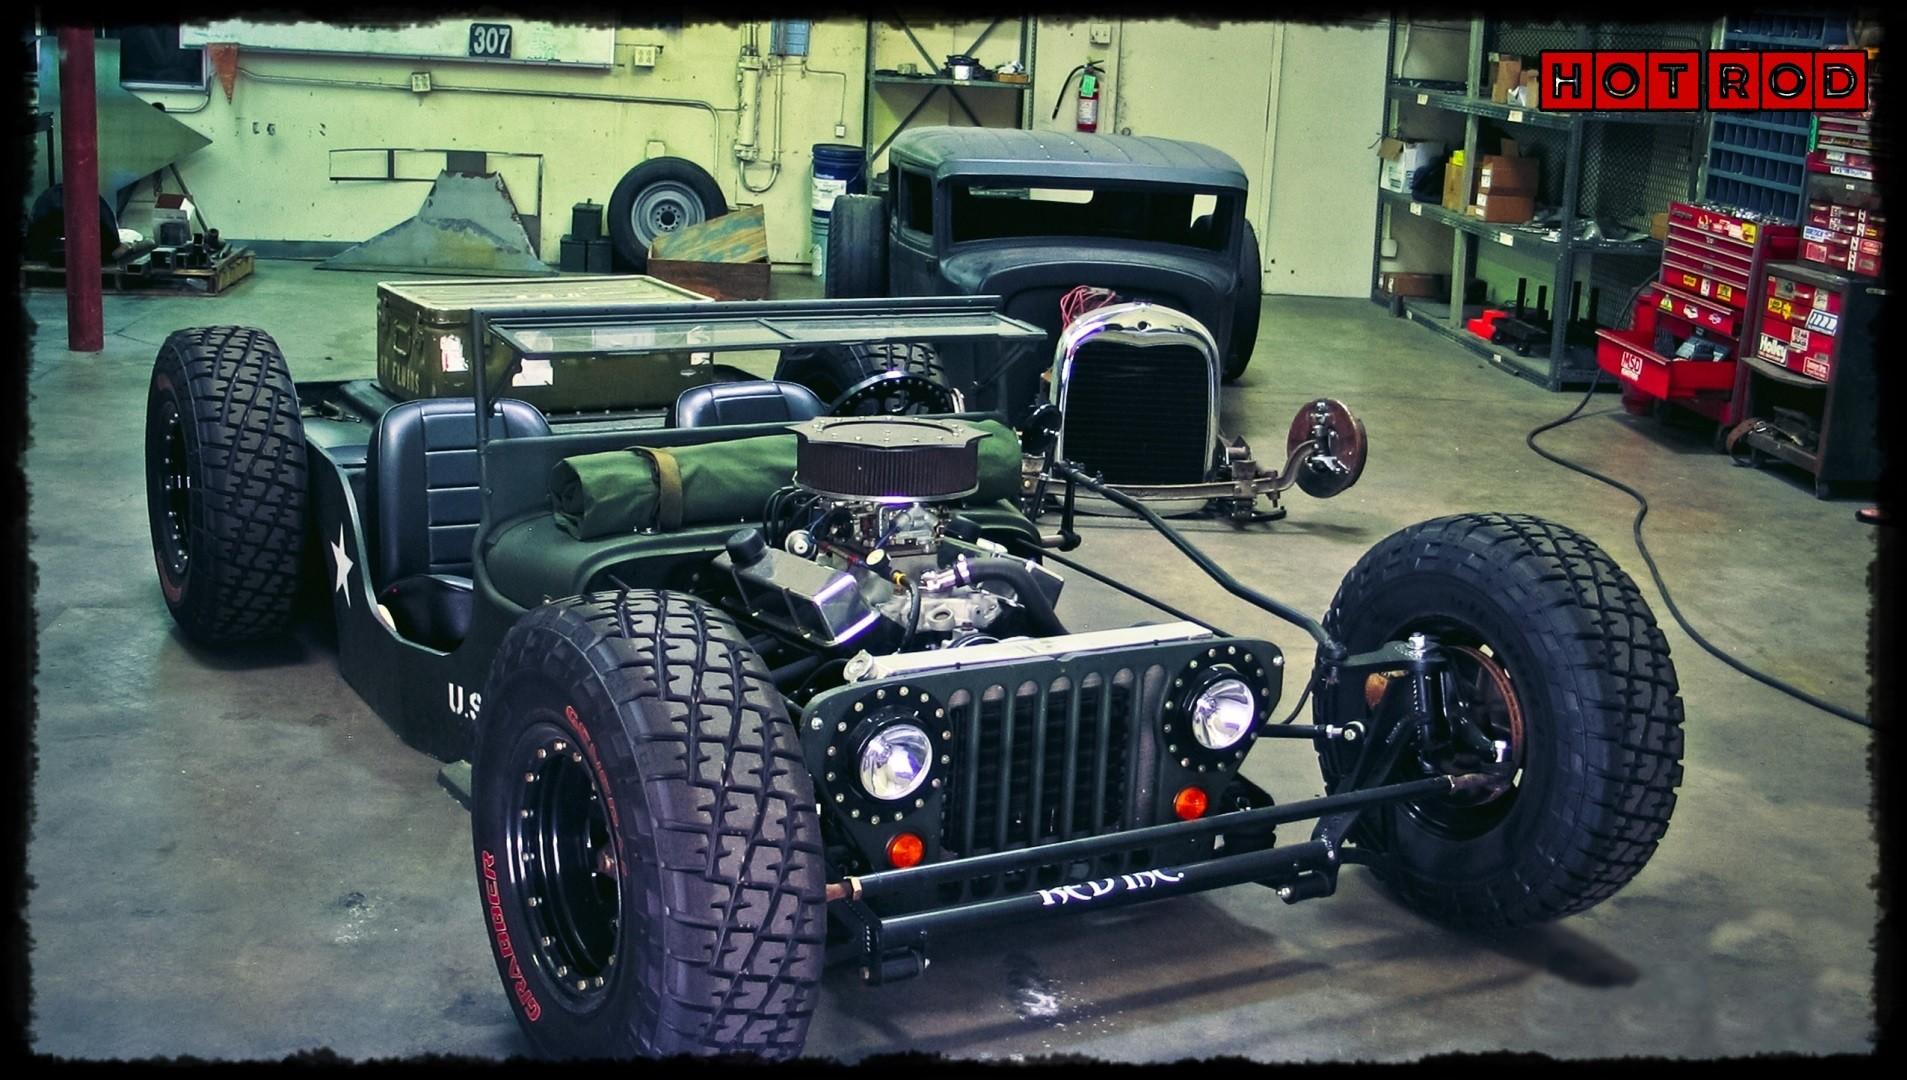 Cfree Cameros Racing Car Wallpapers Wallpaper Sports Car Hot Rod Jeep Land Vehicle Race